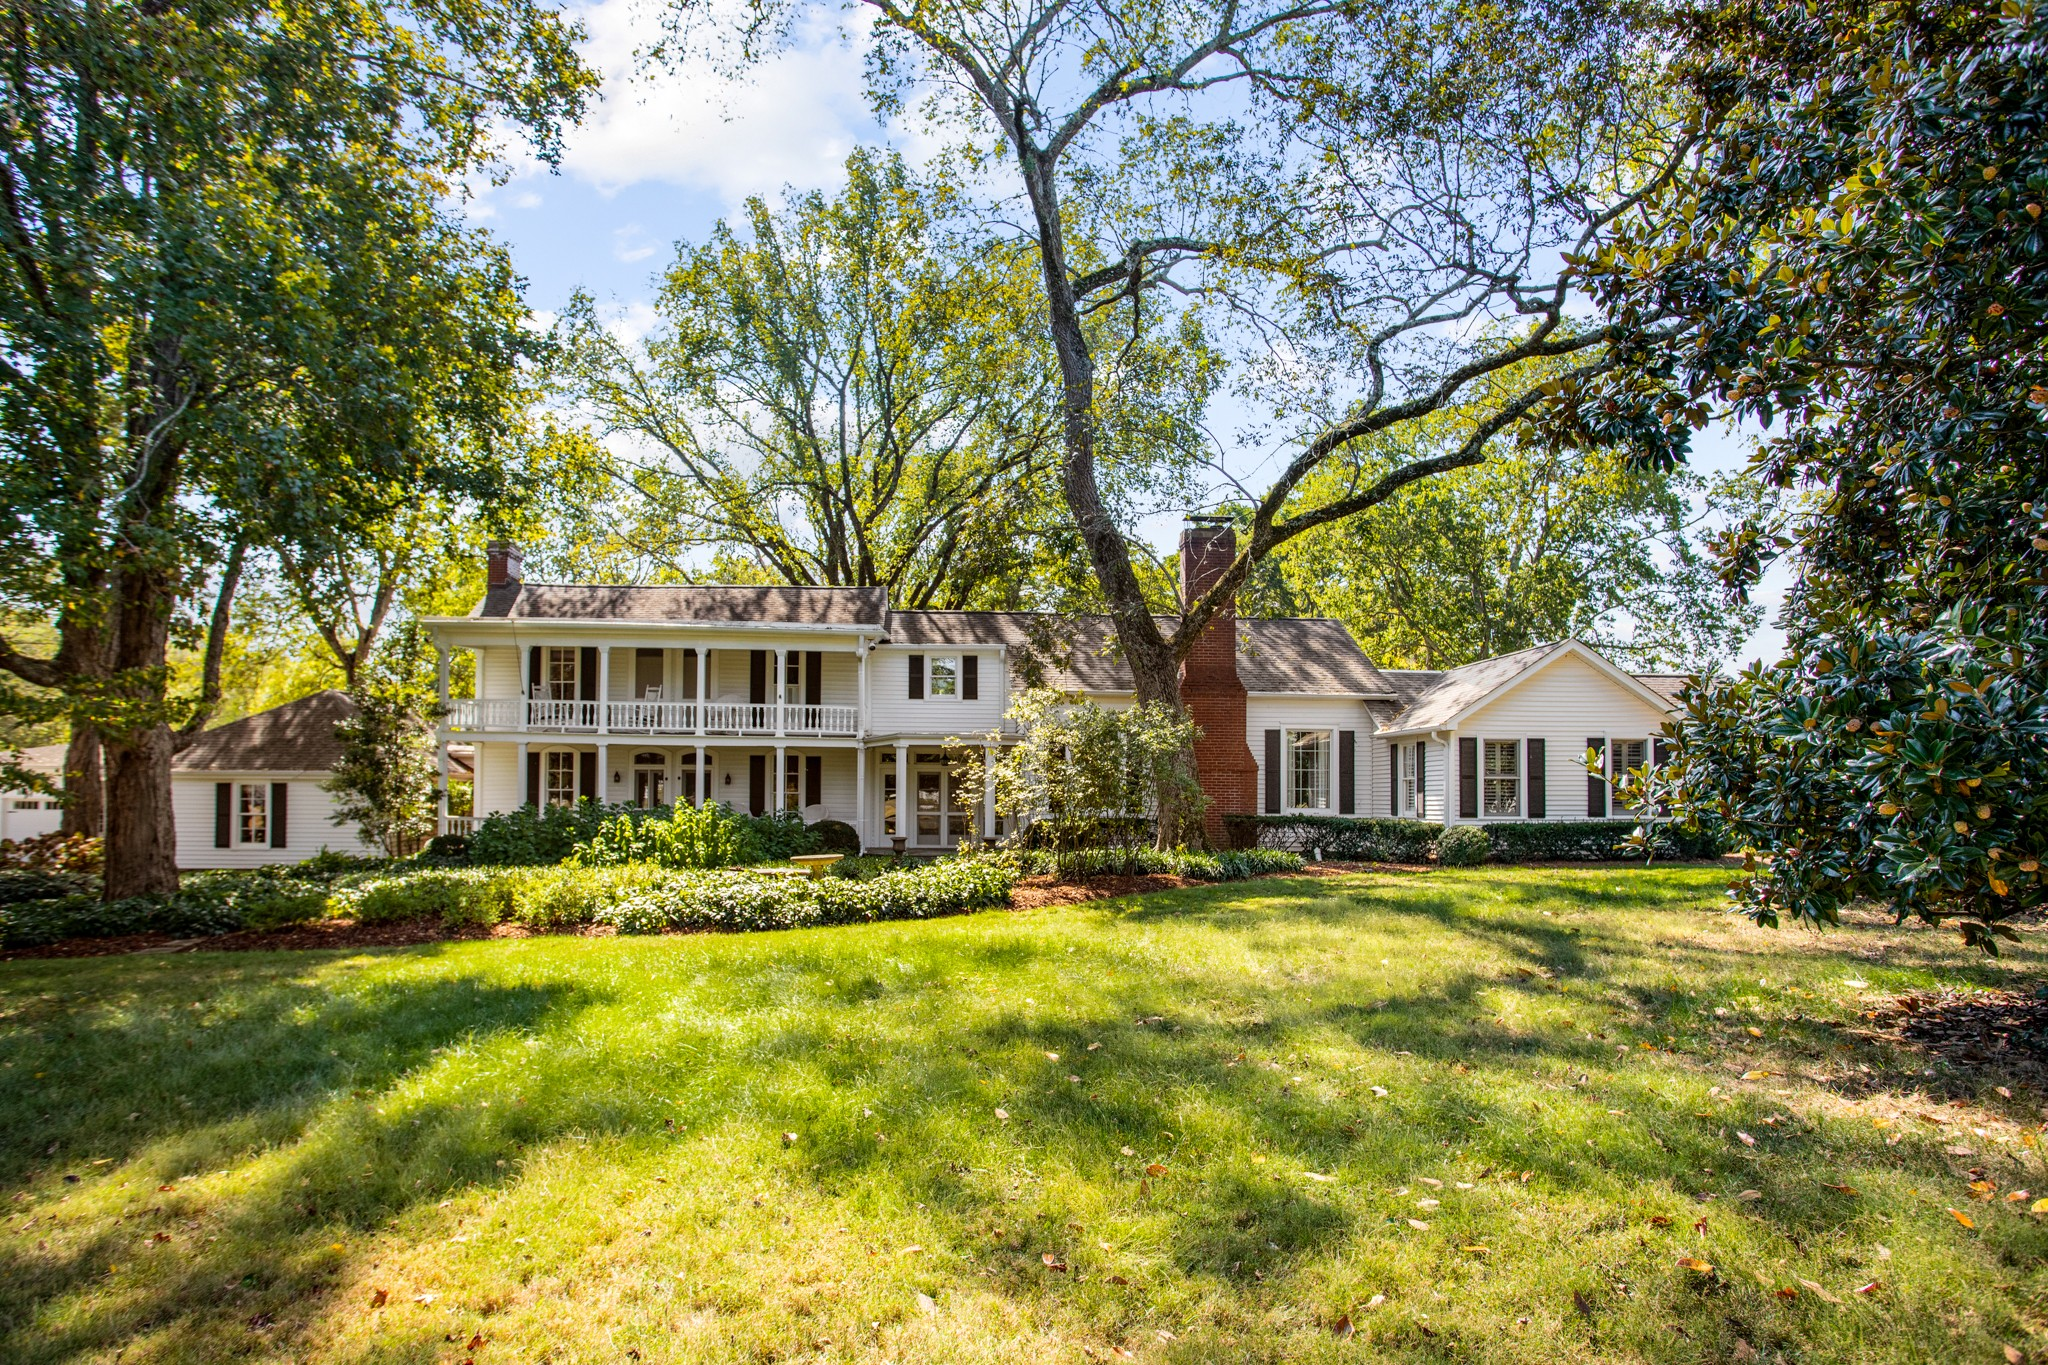 529 Sneed Rd, W, Nashville, TN 37221 - Nashville, TN real estate listing